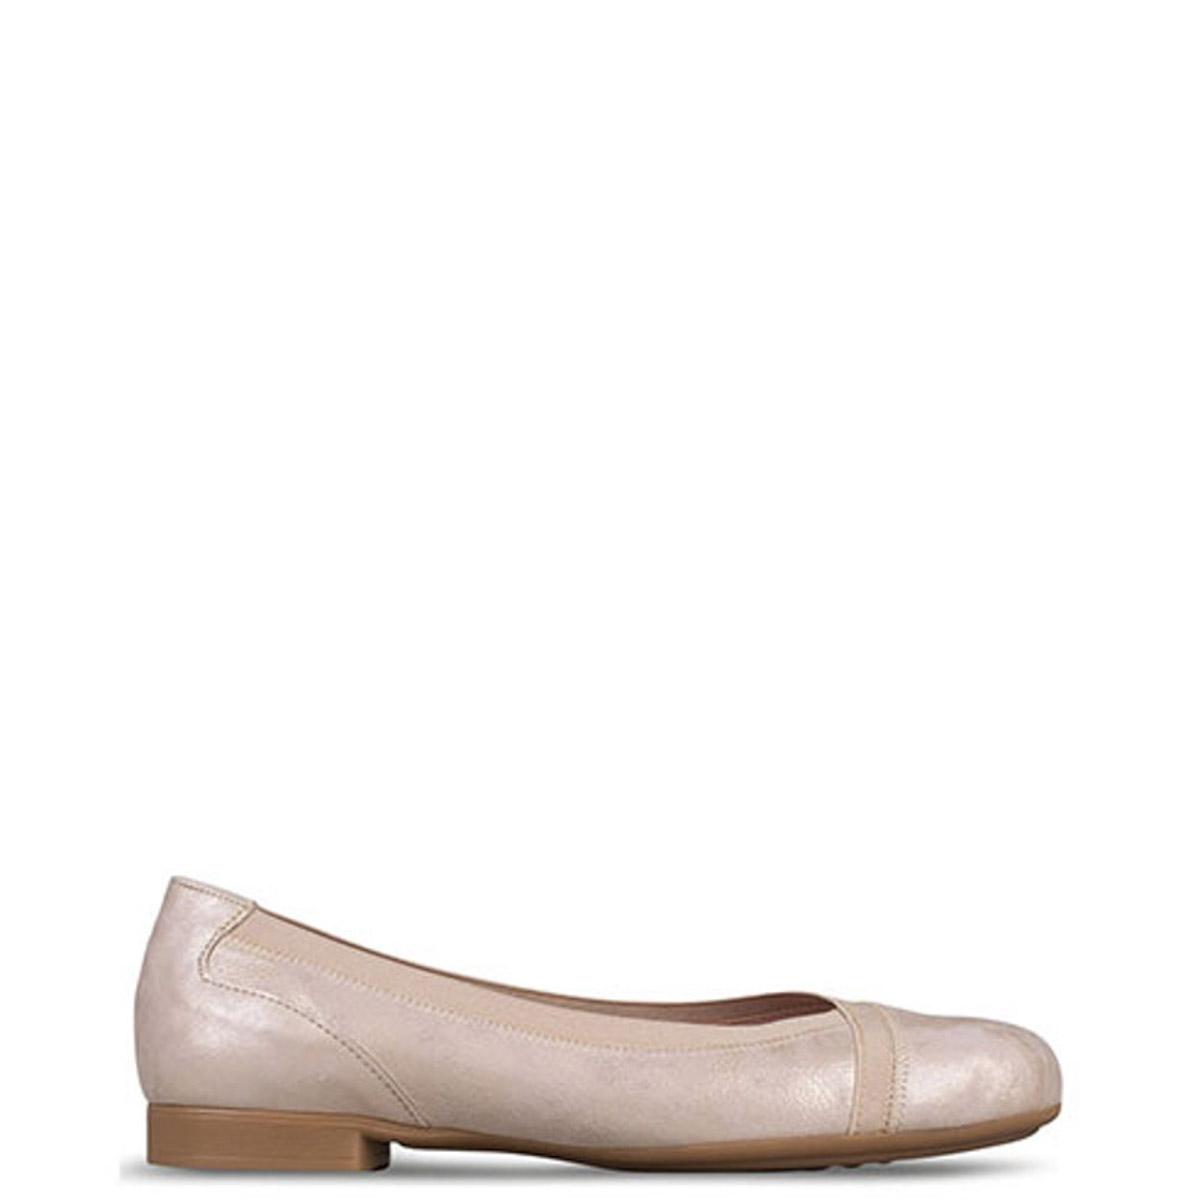 Flat γυναικεία Classico Donna Χρυσό - Έως 3 Άτοκες Δόσεις άνω των 60€